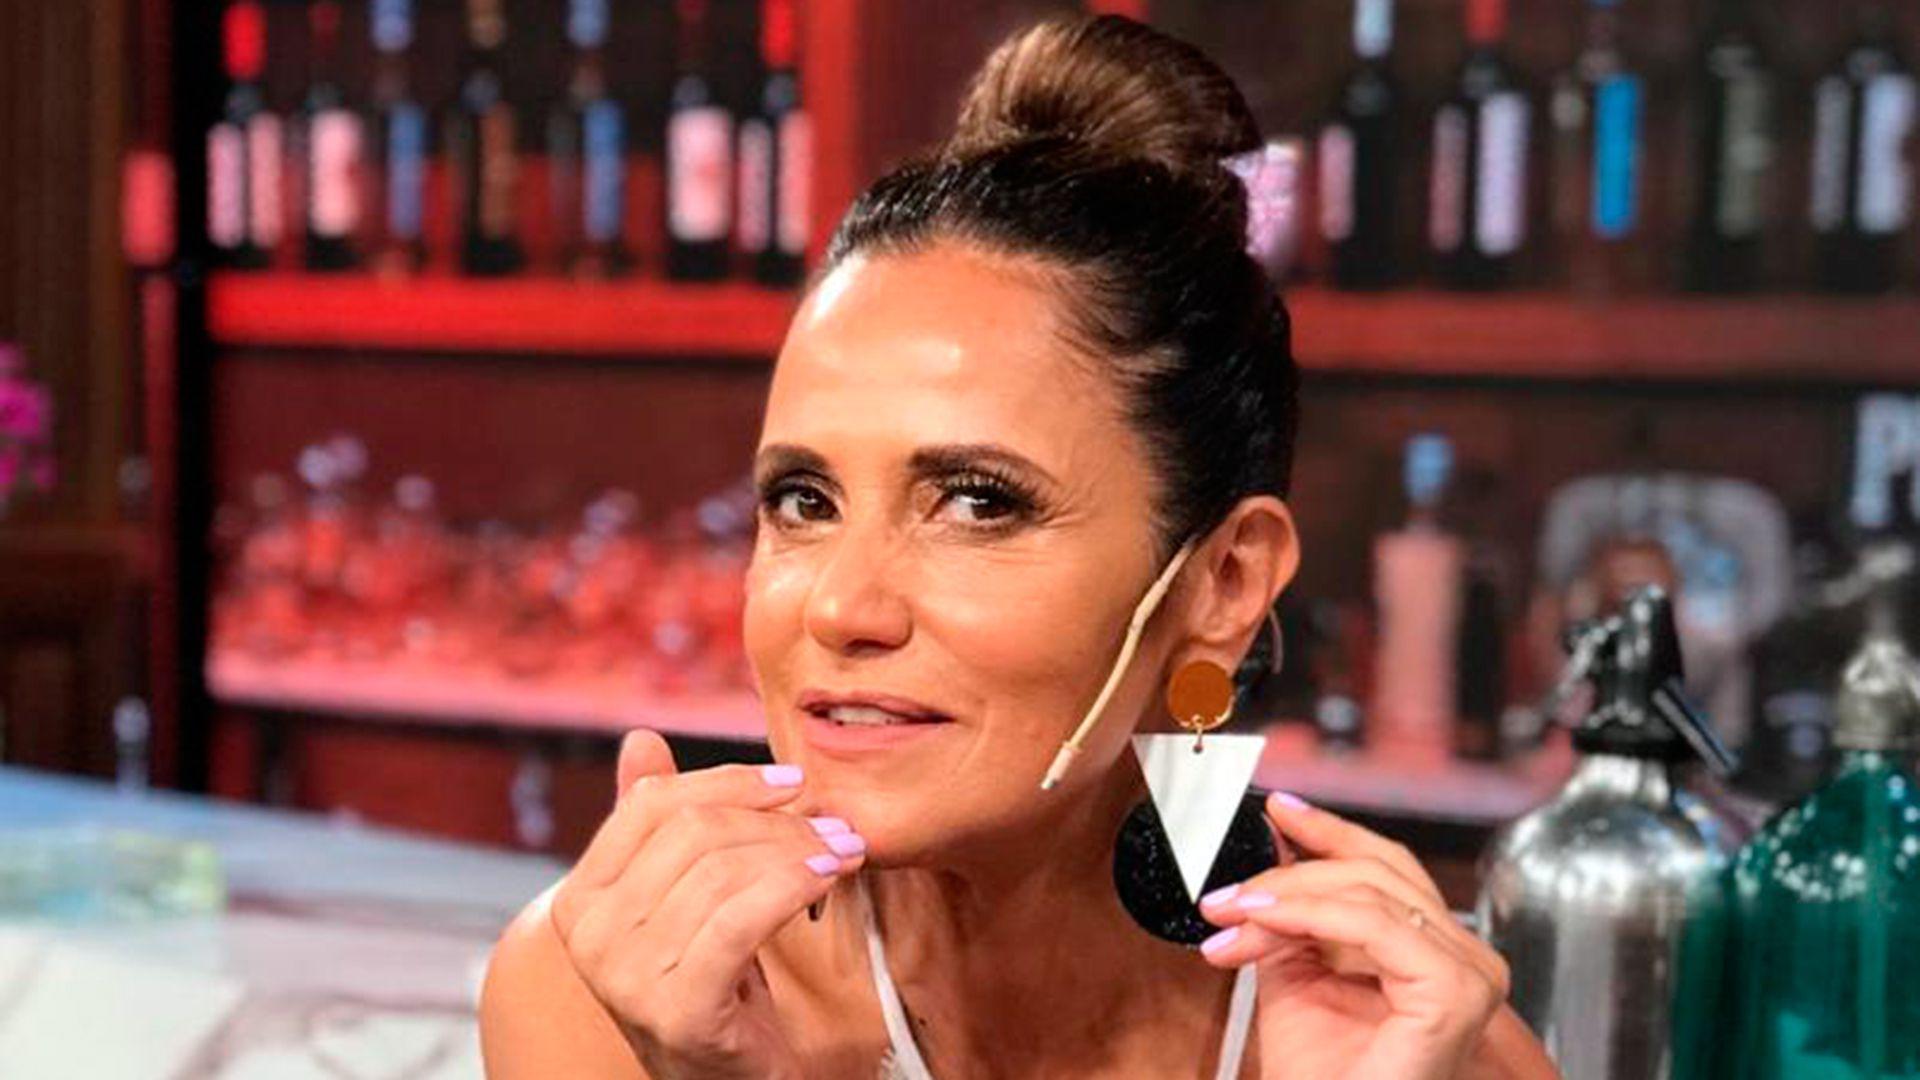 María Fernanda Callejon